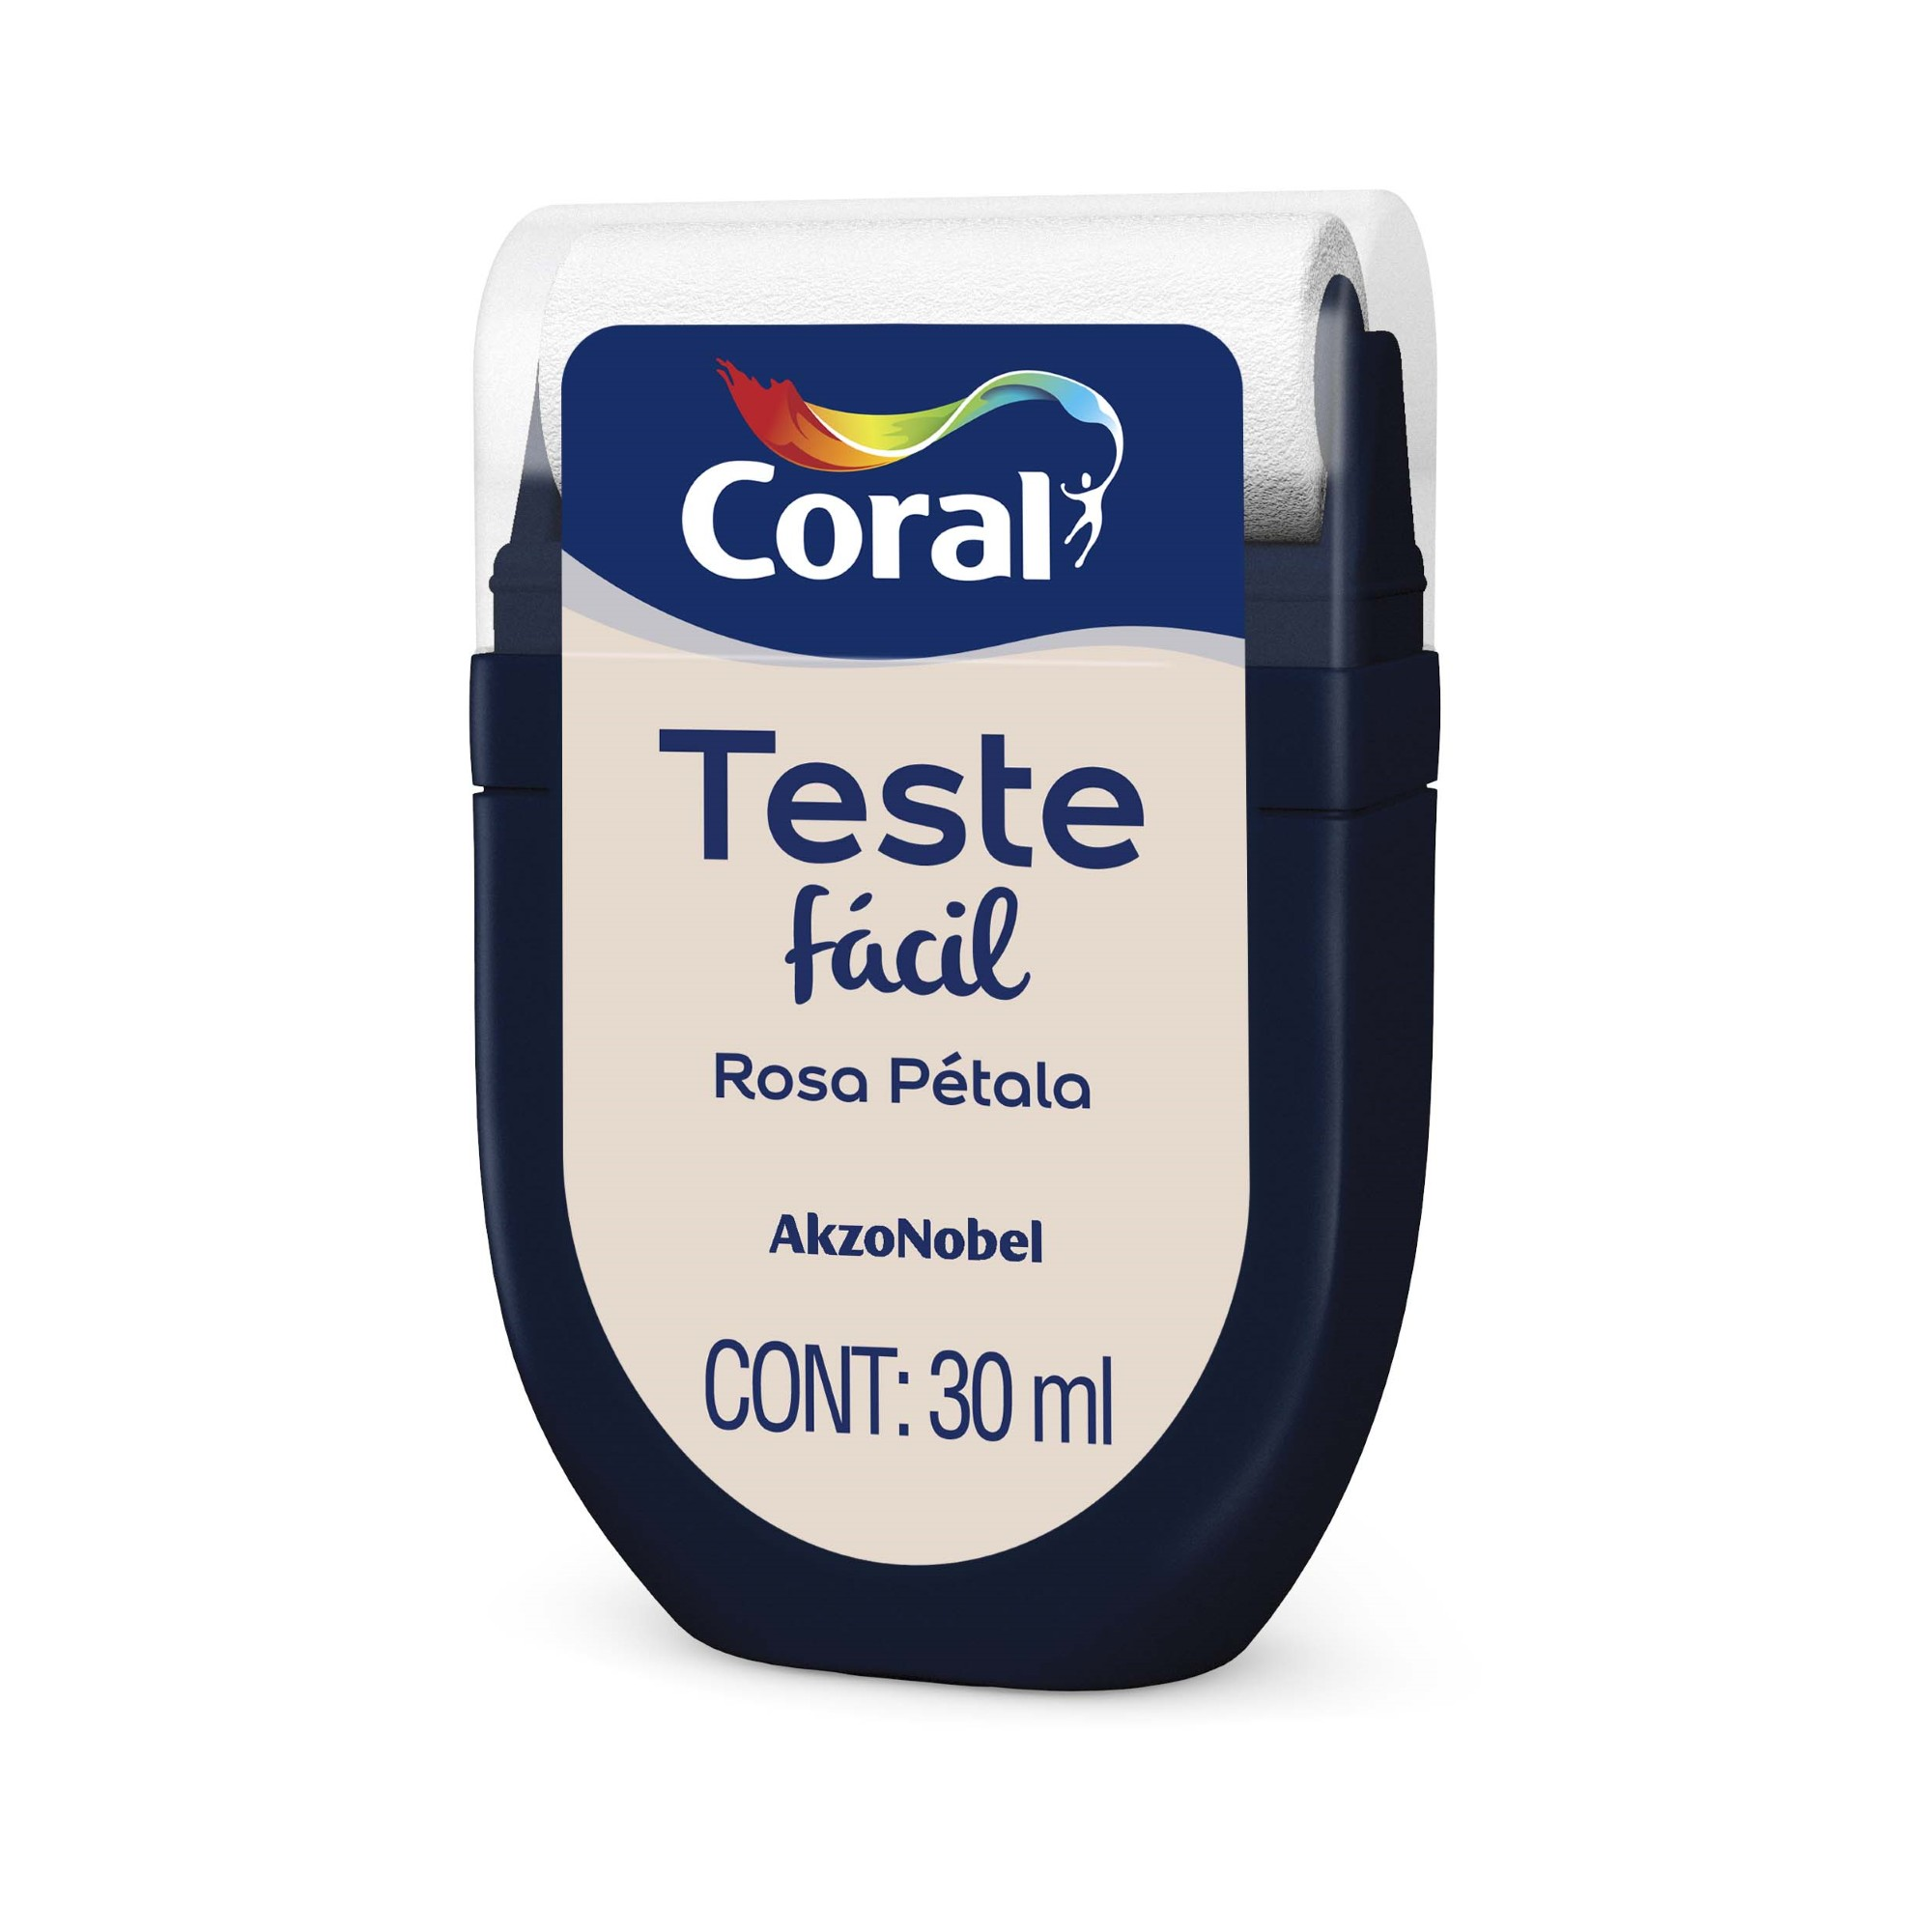 Teste Facil Rosa Petala 30ml - Coral